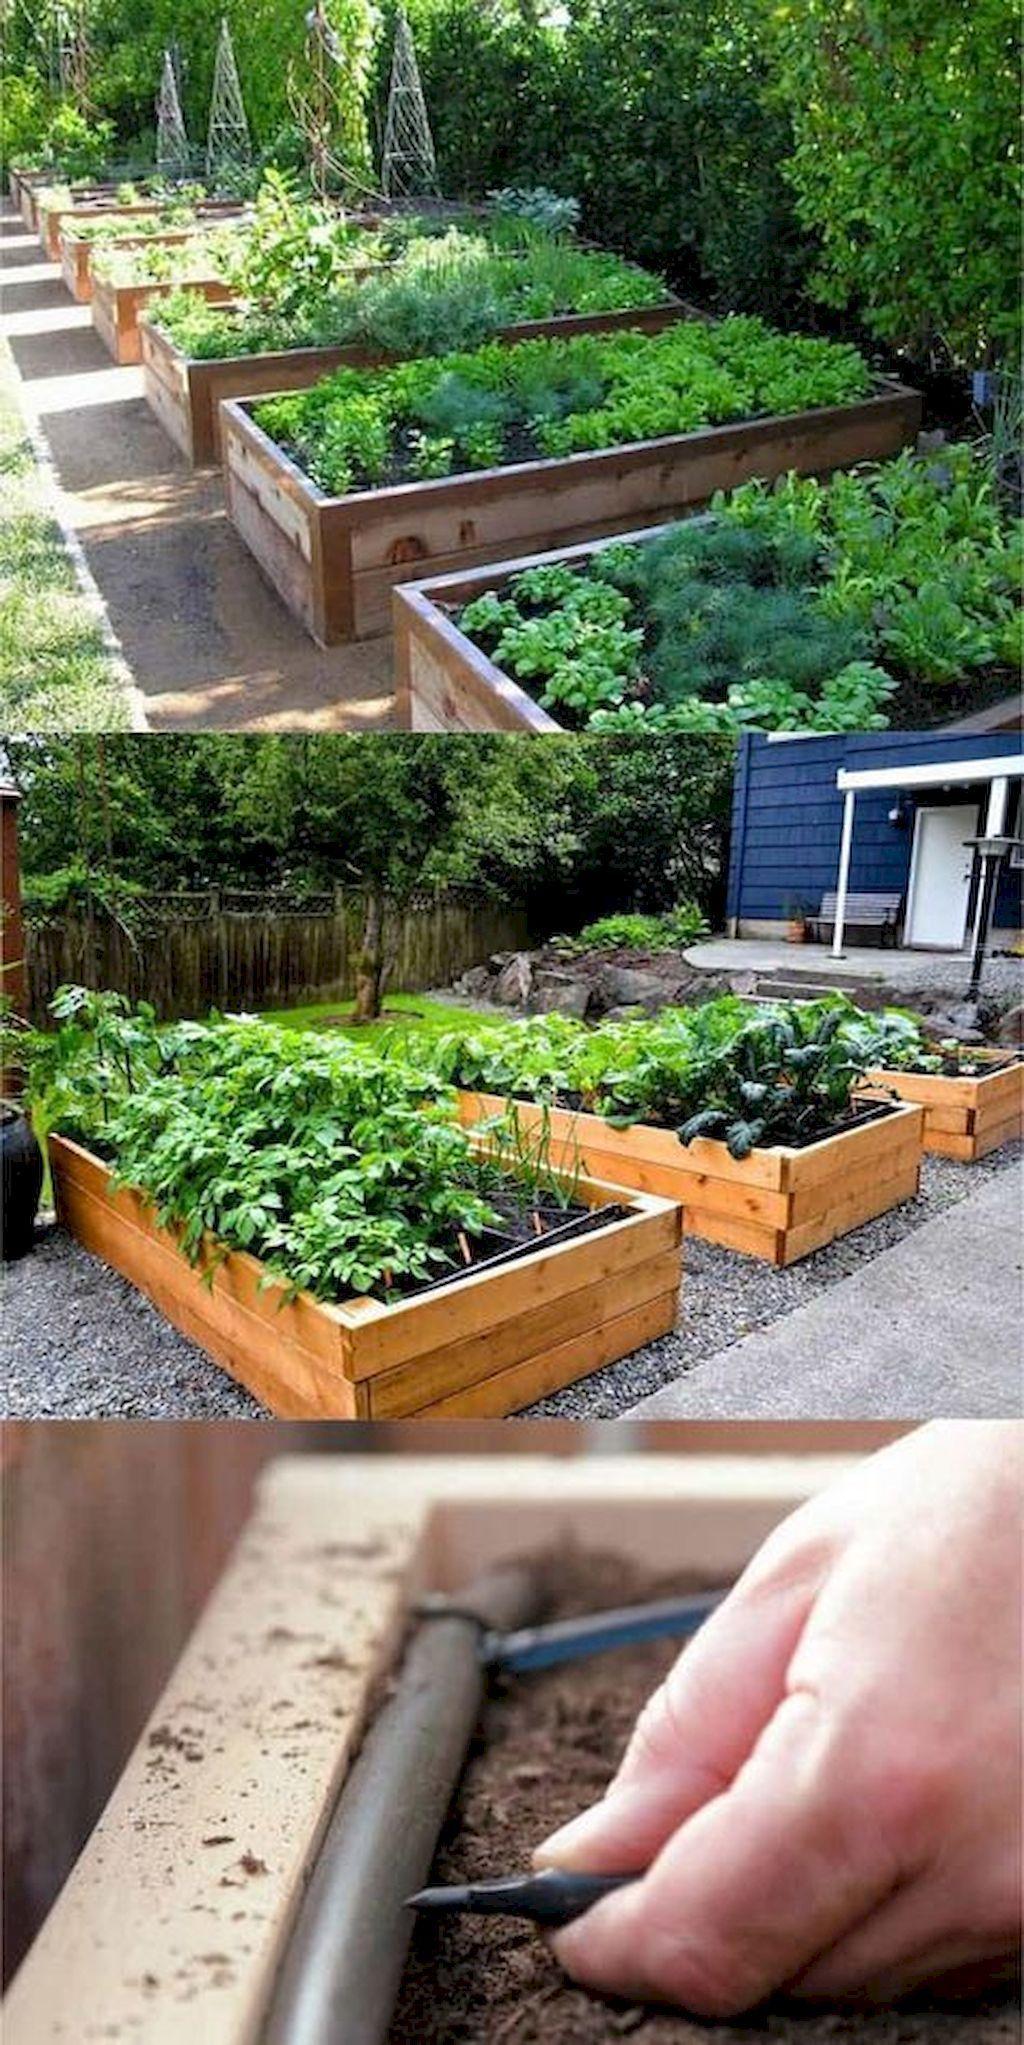 Vegetablegardeningideas Vegetable Garden Raised Beds Small Vegetable Gardens Diy Raised Garden Backyard raised bed garden design